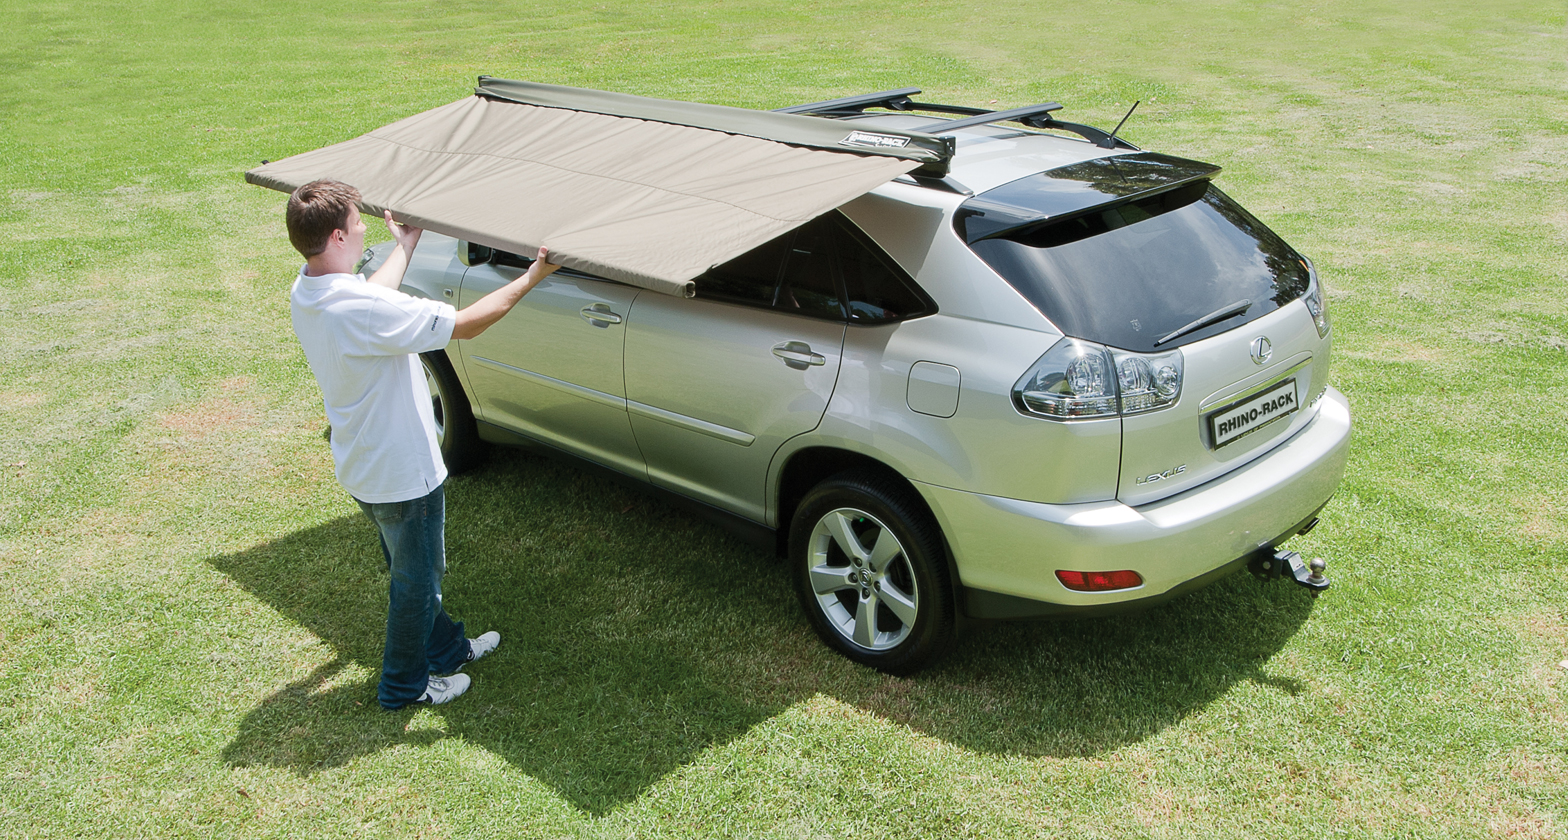 rhino rack sunseeker 2 5 vehicle awning